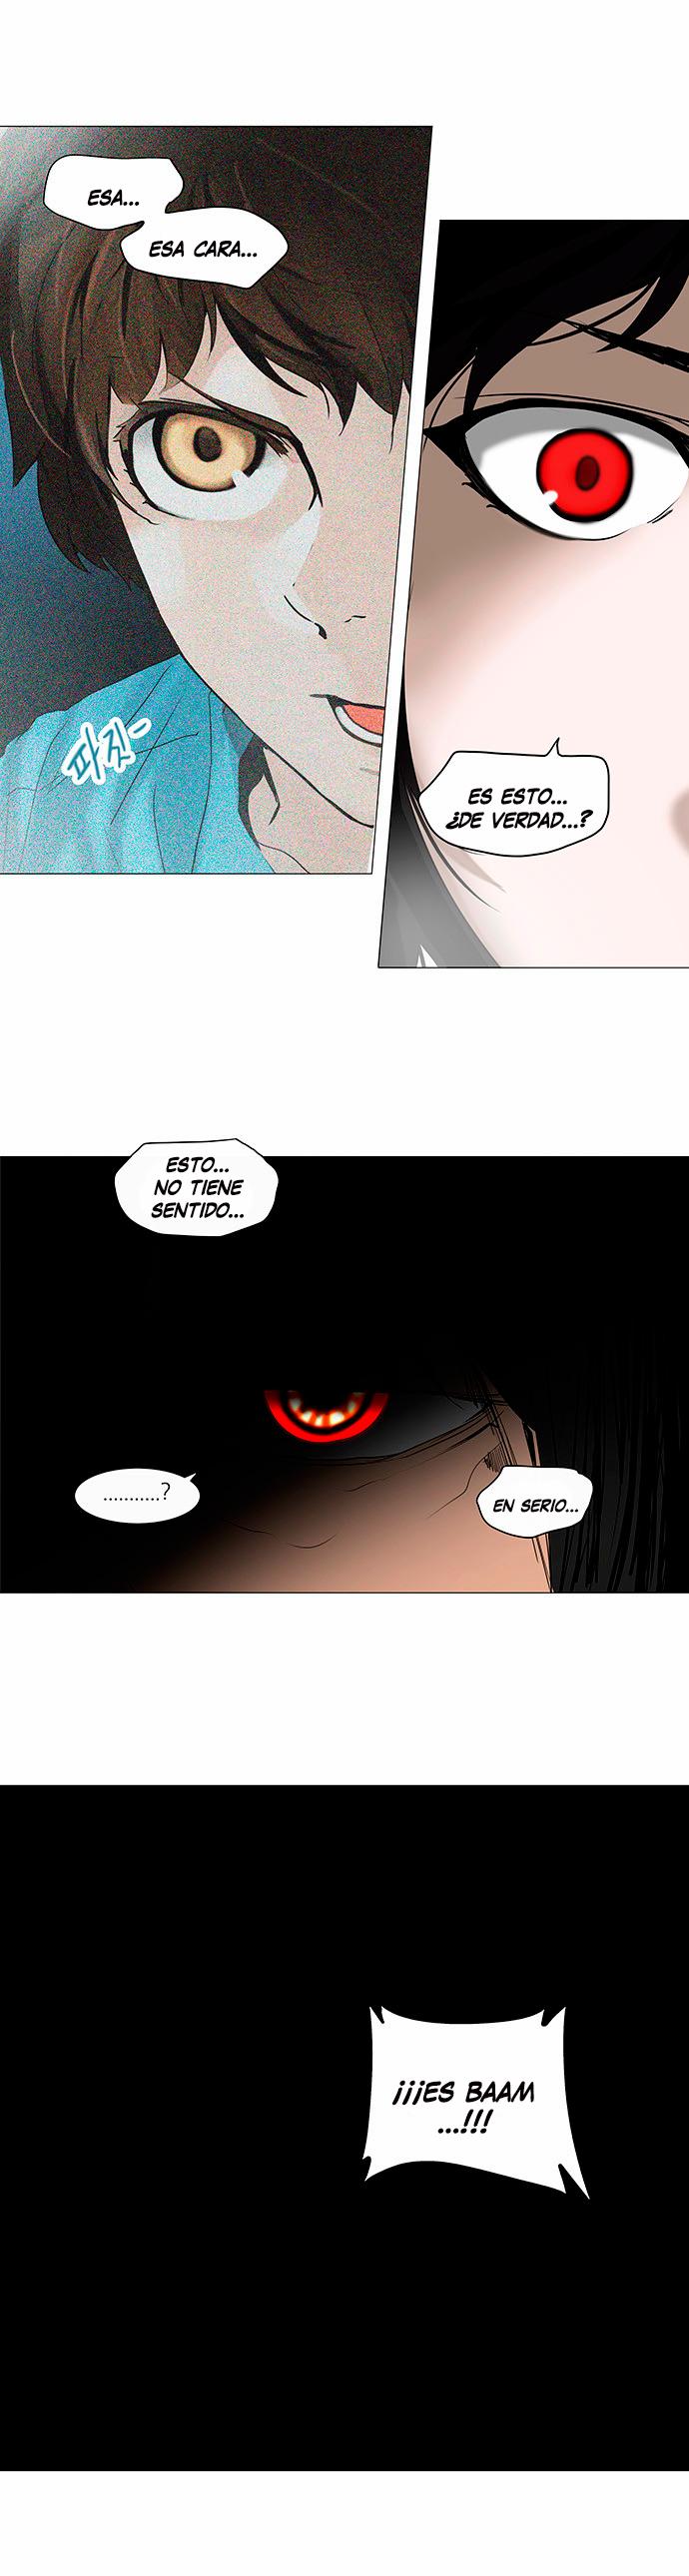 http://c5.ninemanga.com/es_manga/21/149/420201/949686ecef4ee20a62d16b4a2d7ccca3.jpg Page 4